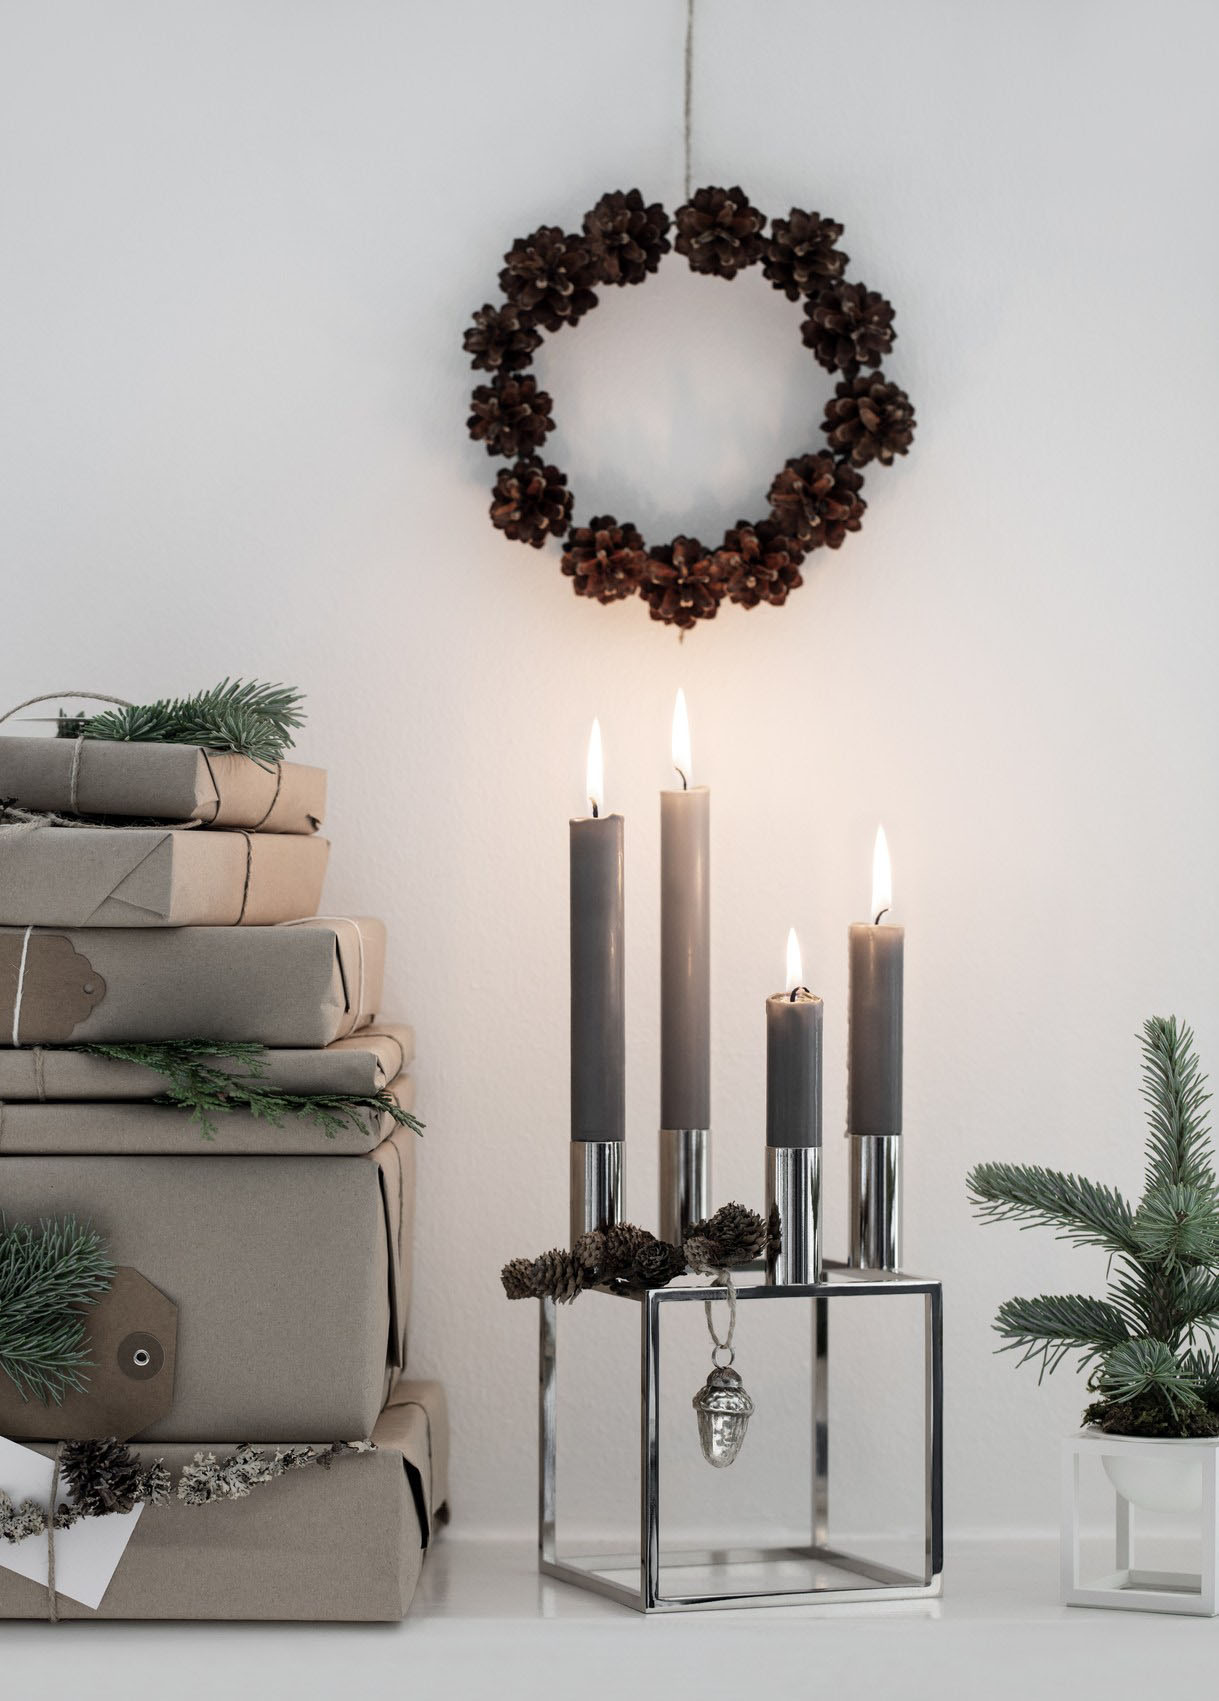 Top Picks Advent Candles Wreaths Calendars Nordic Design